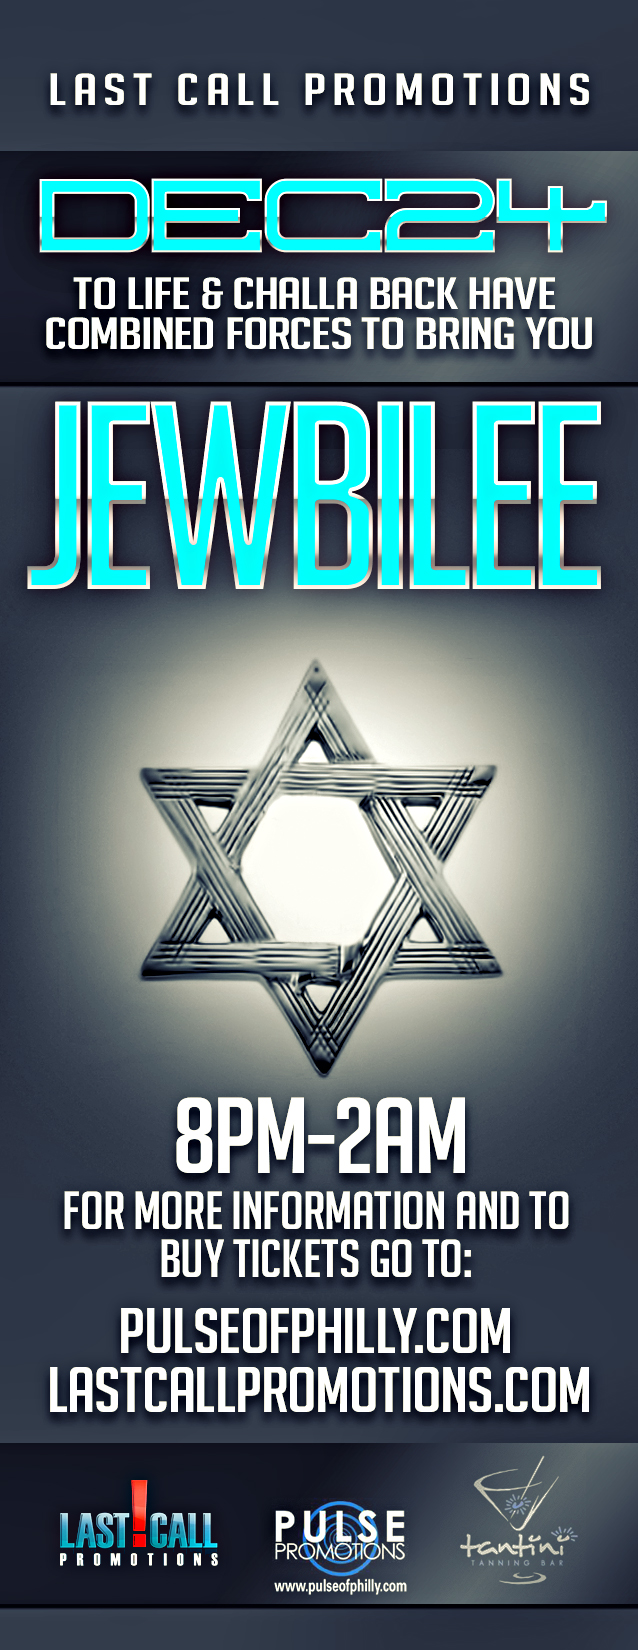 JEWBILEE 2012